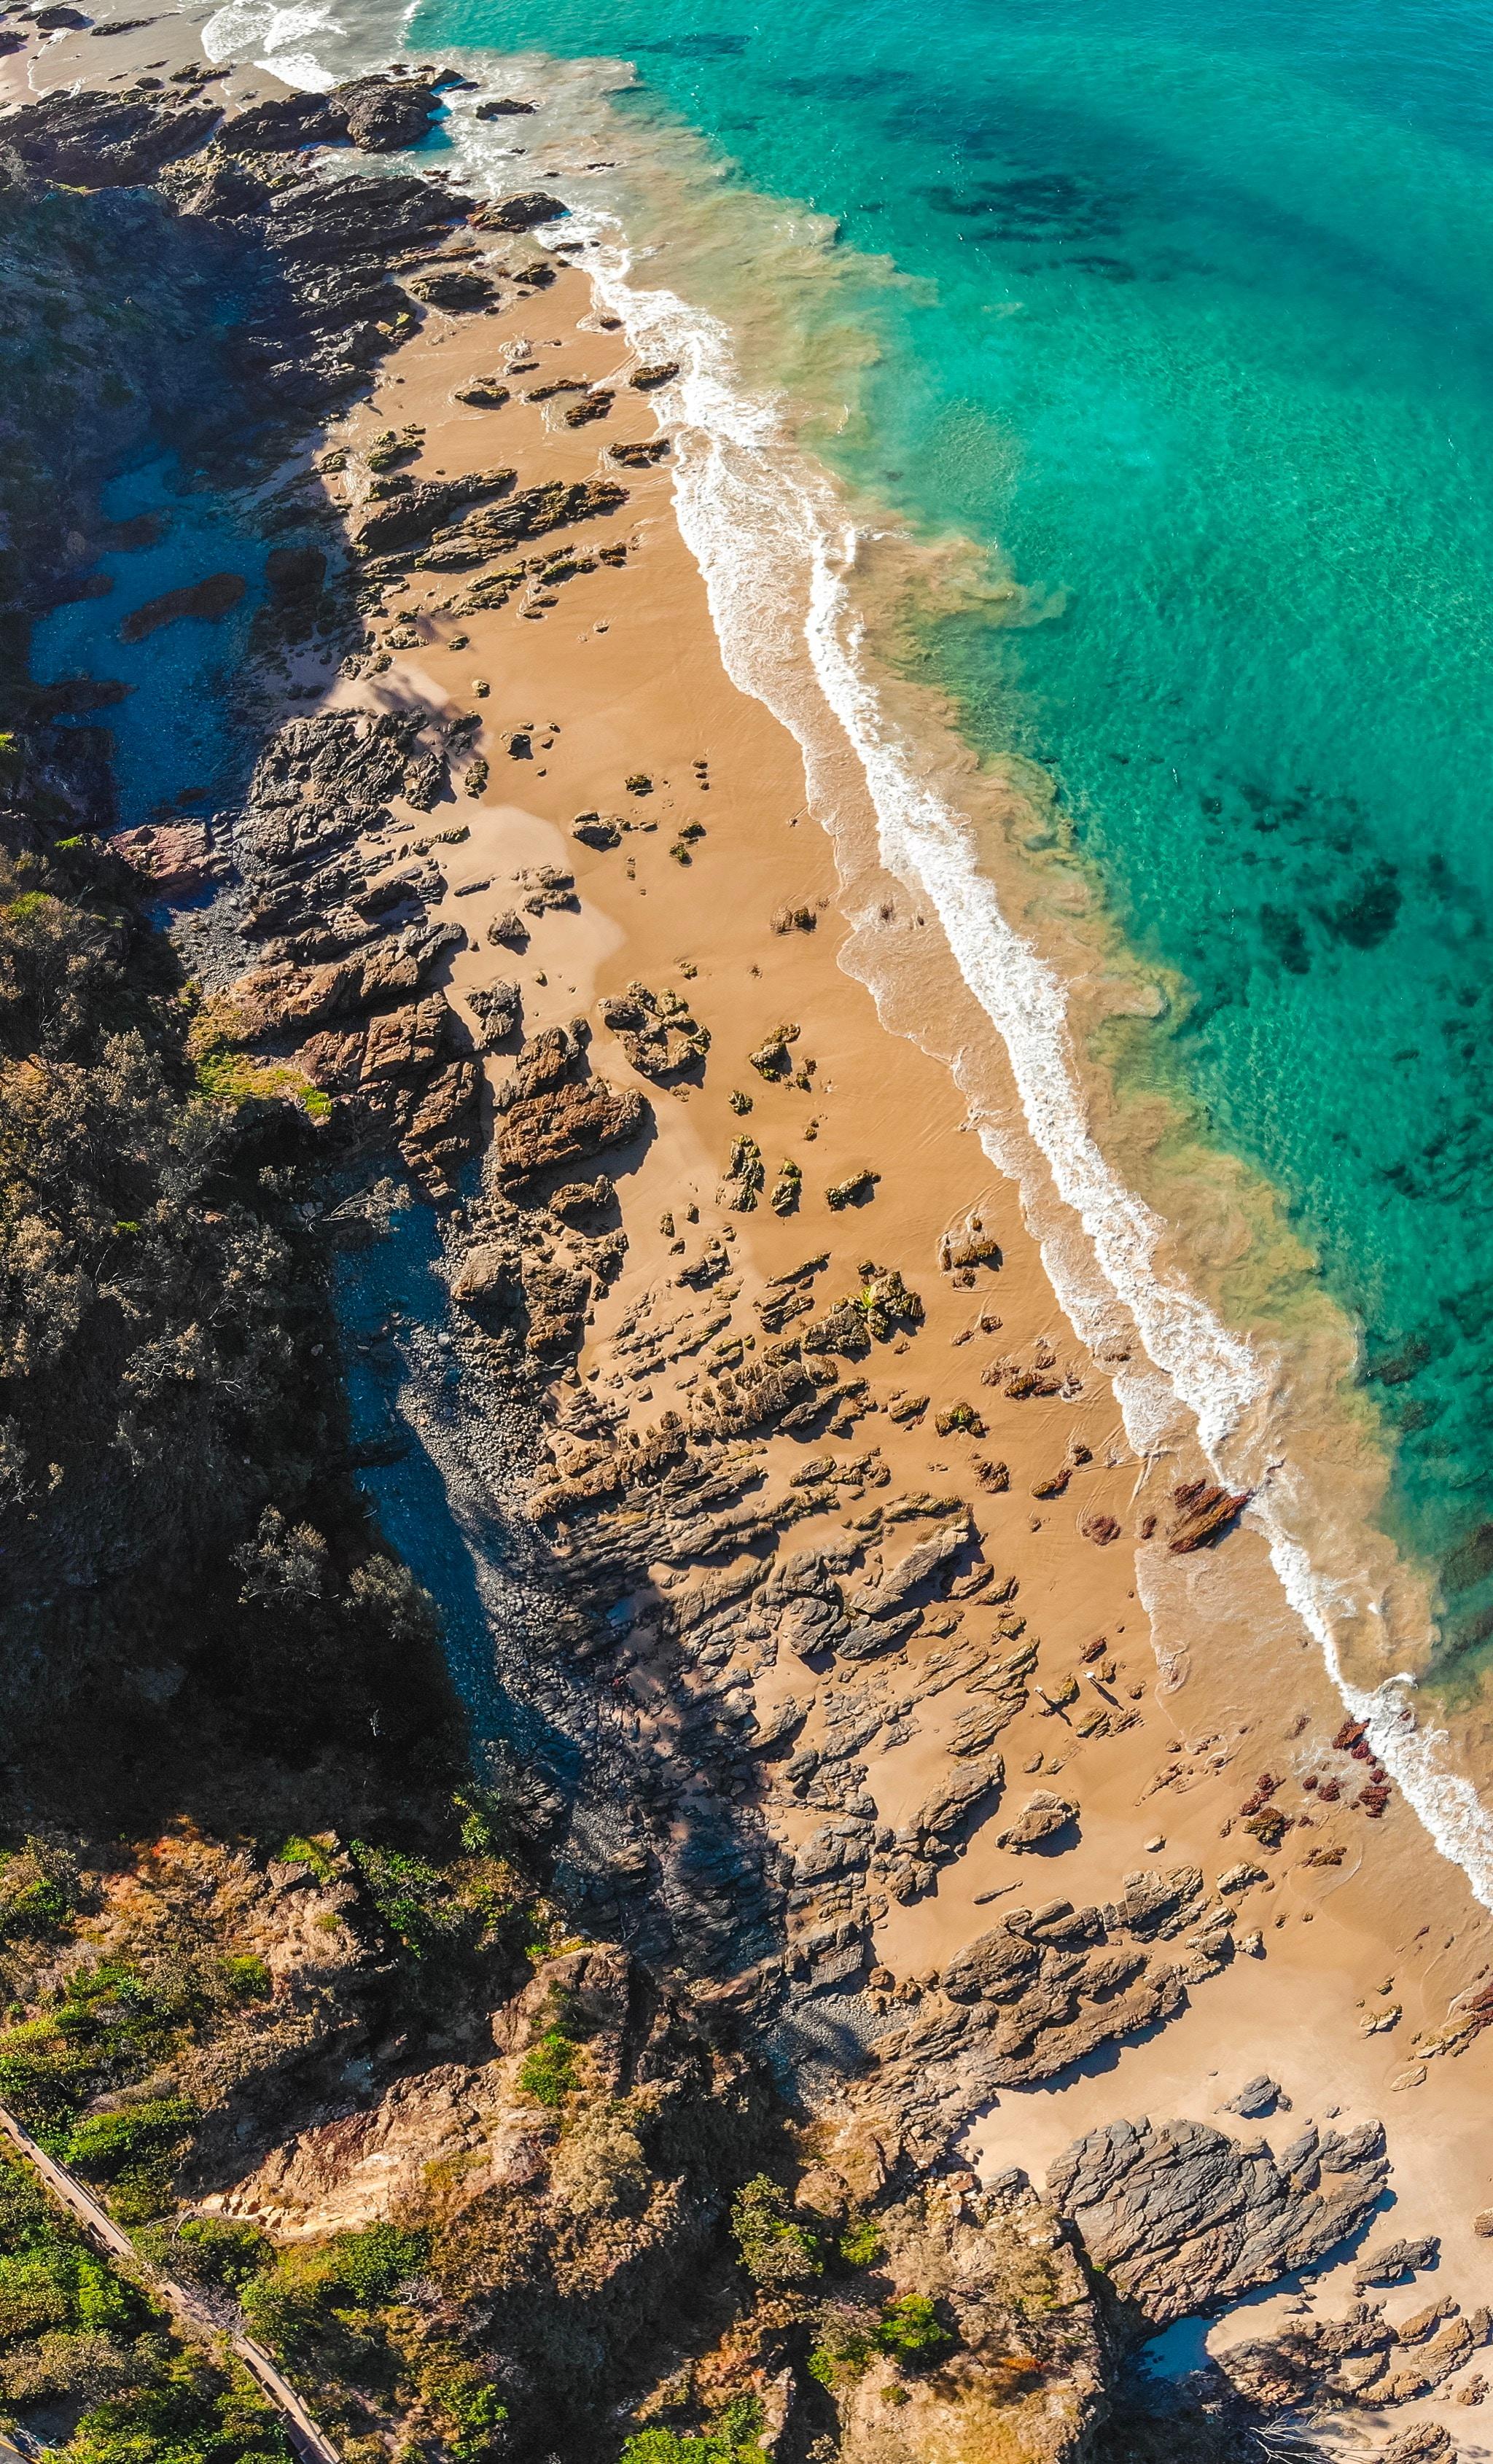 wallpaper Aerial view of beach